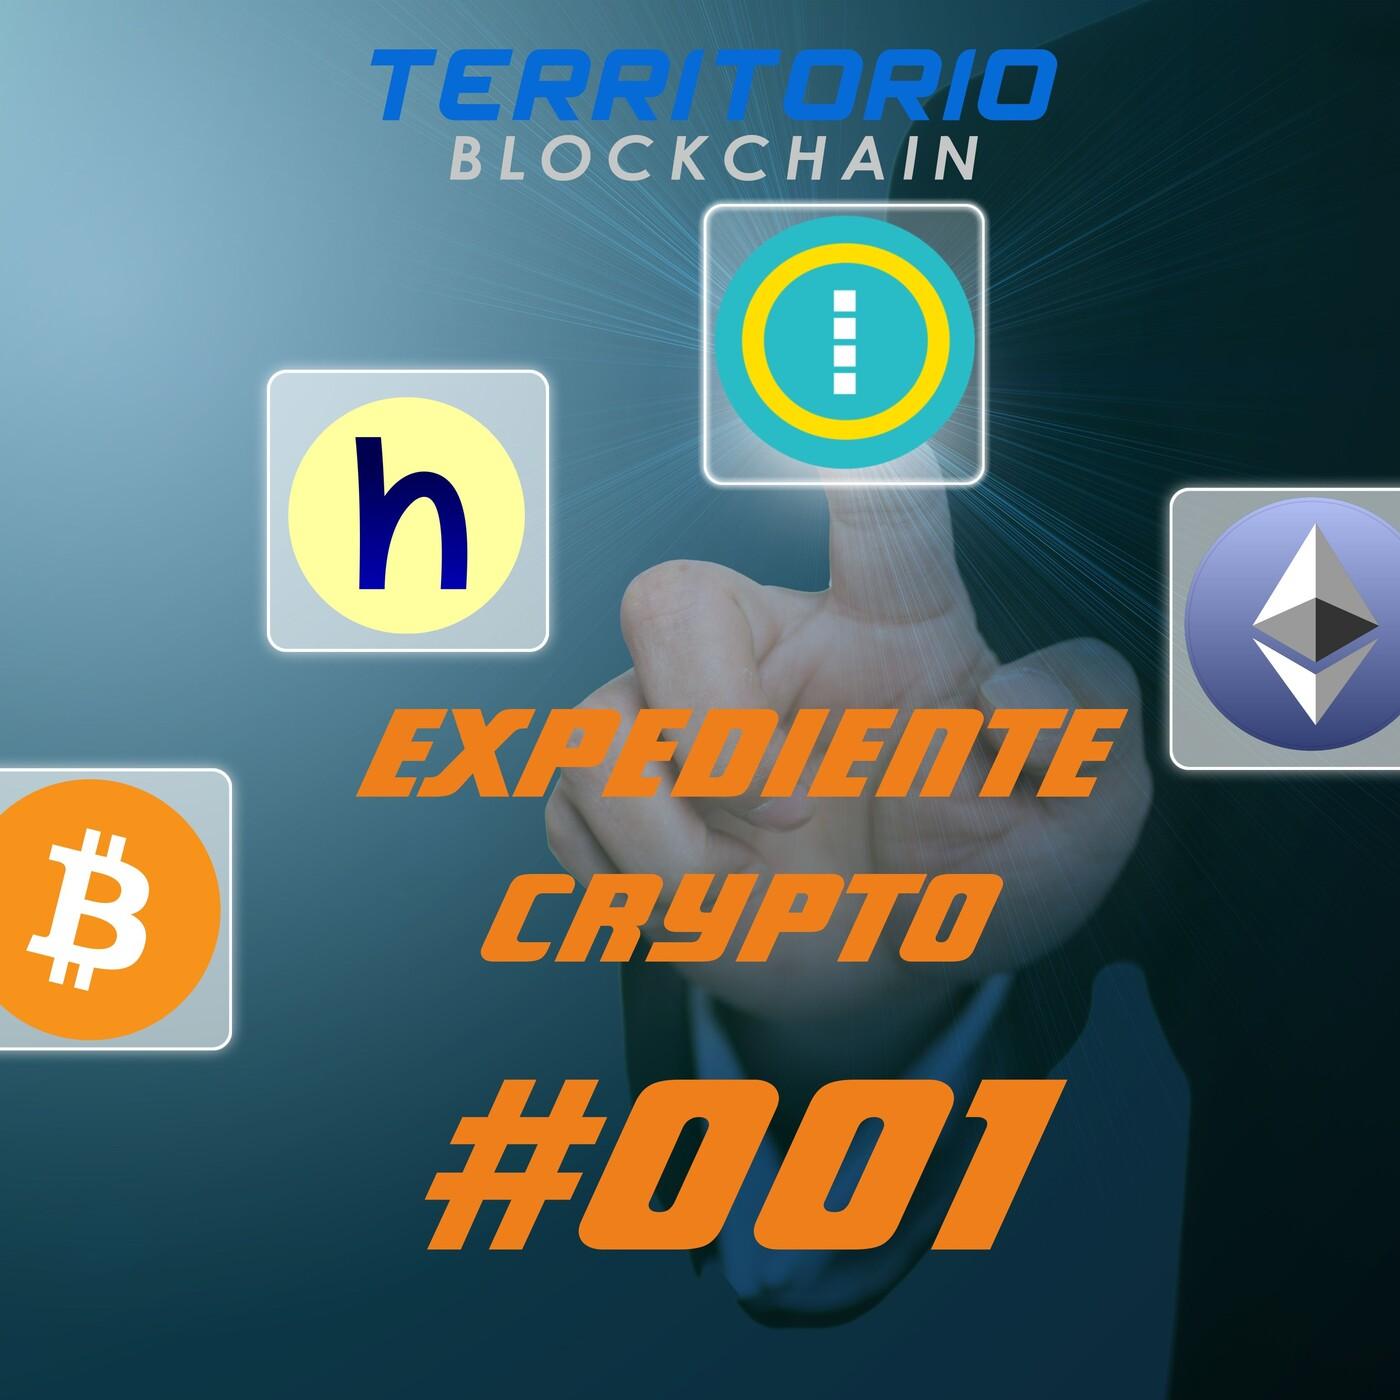 Expediente Crypto #001